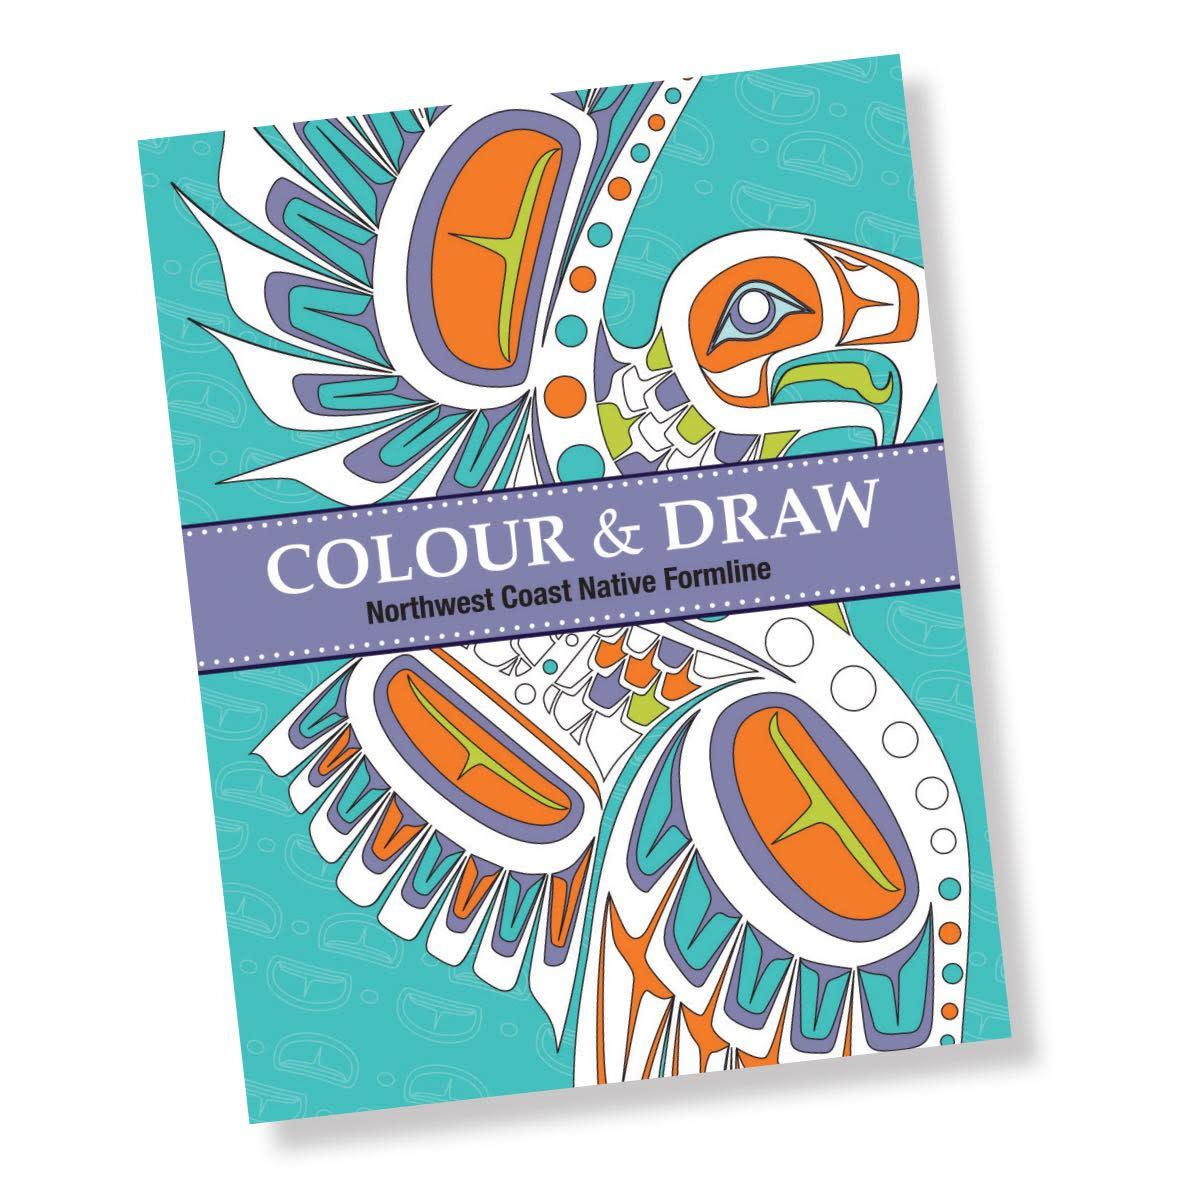 Colouring Book - Colour & Draw: Northwest Coast Native Formline-1